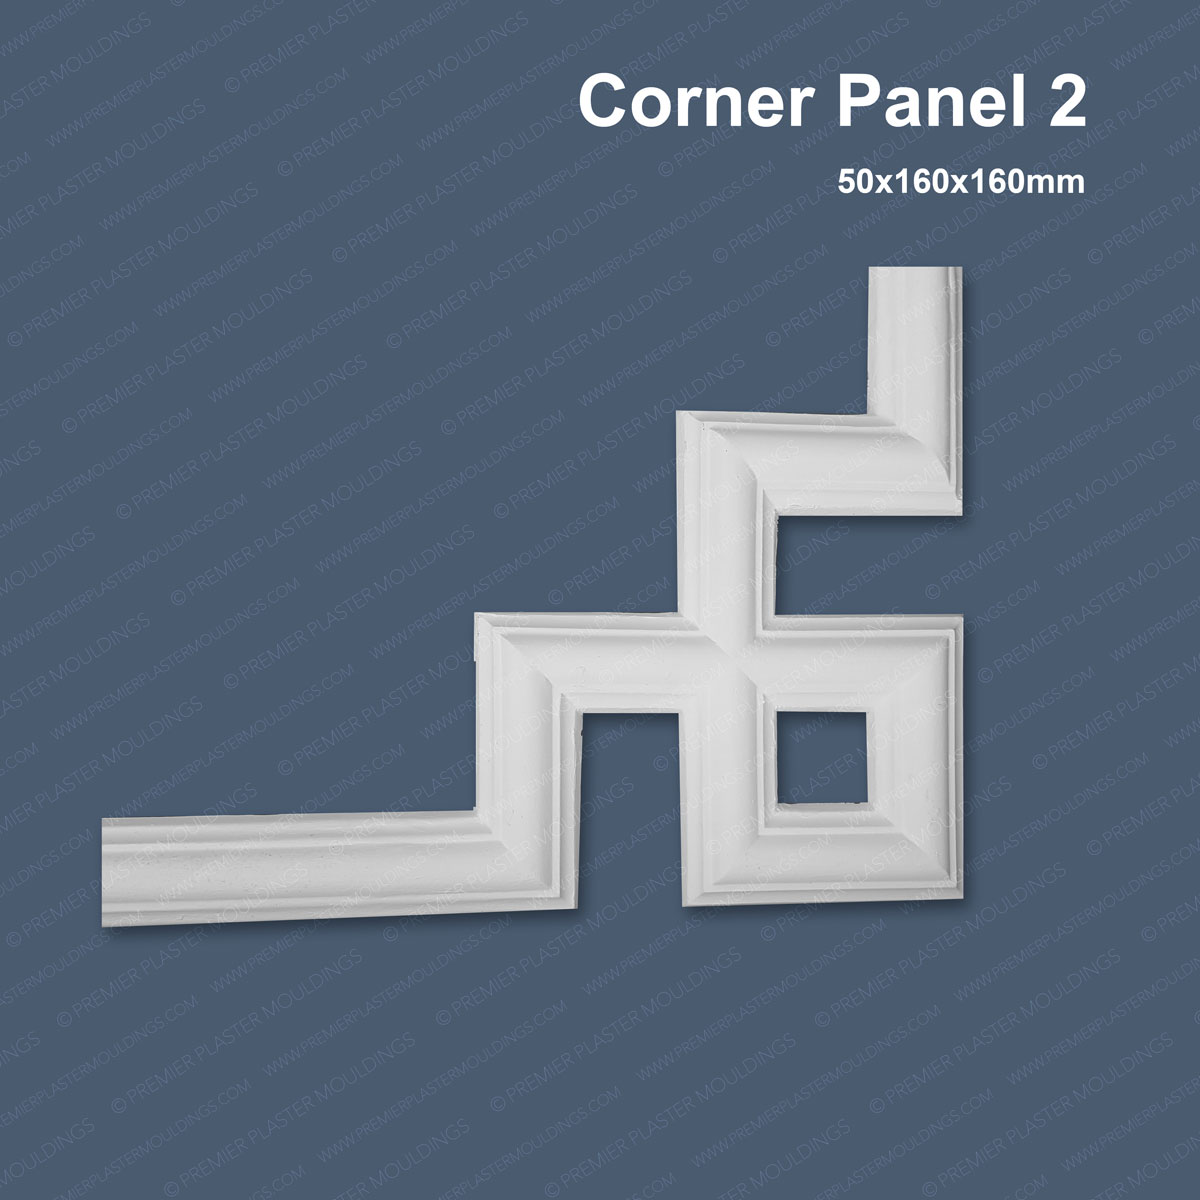 Corner Panel 2